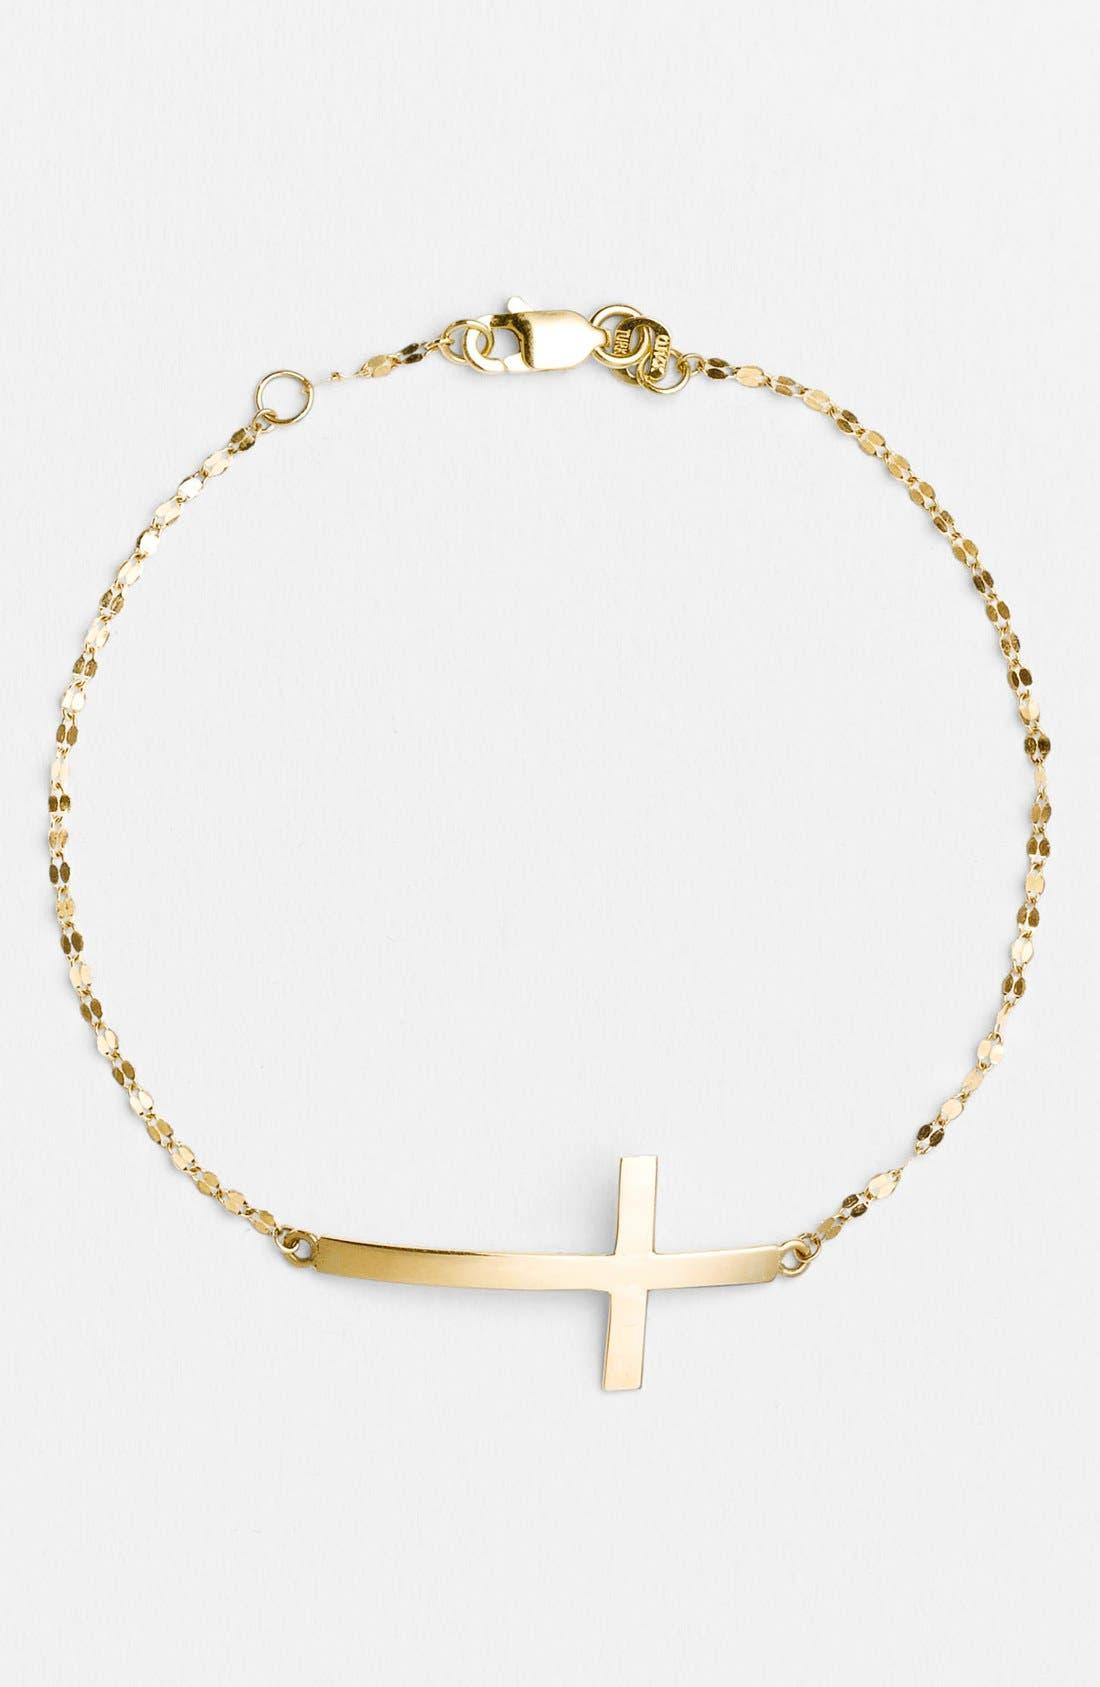 Alternate Image 1 Selected - Lana Jewelry Cross Station Bracelet